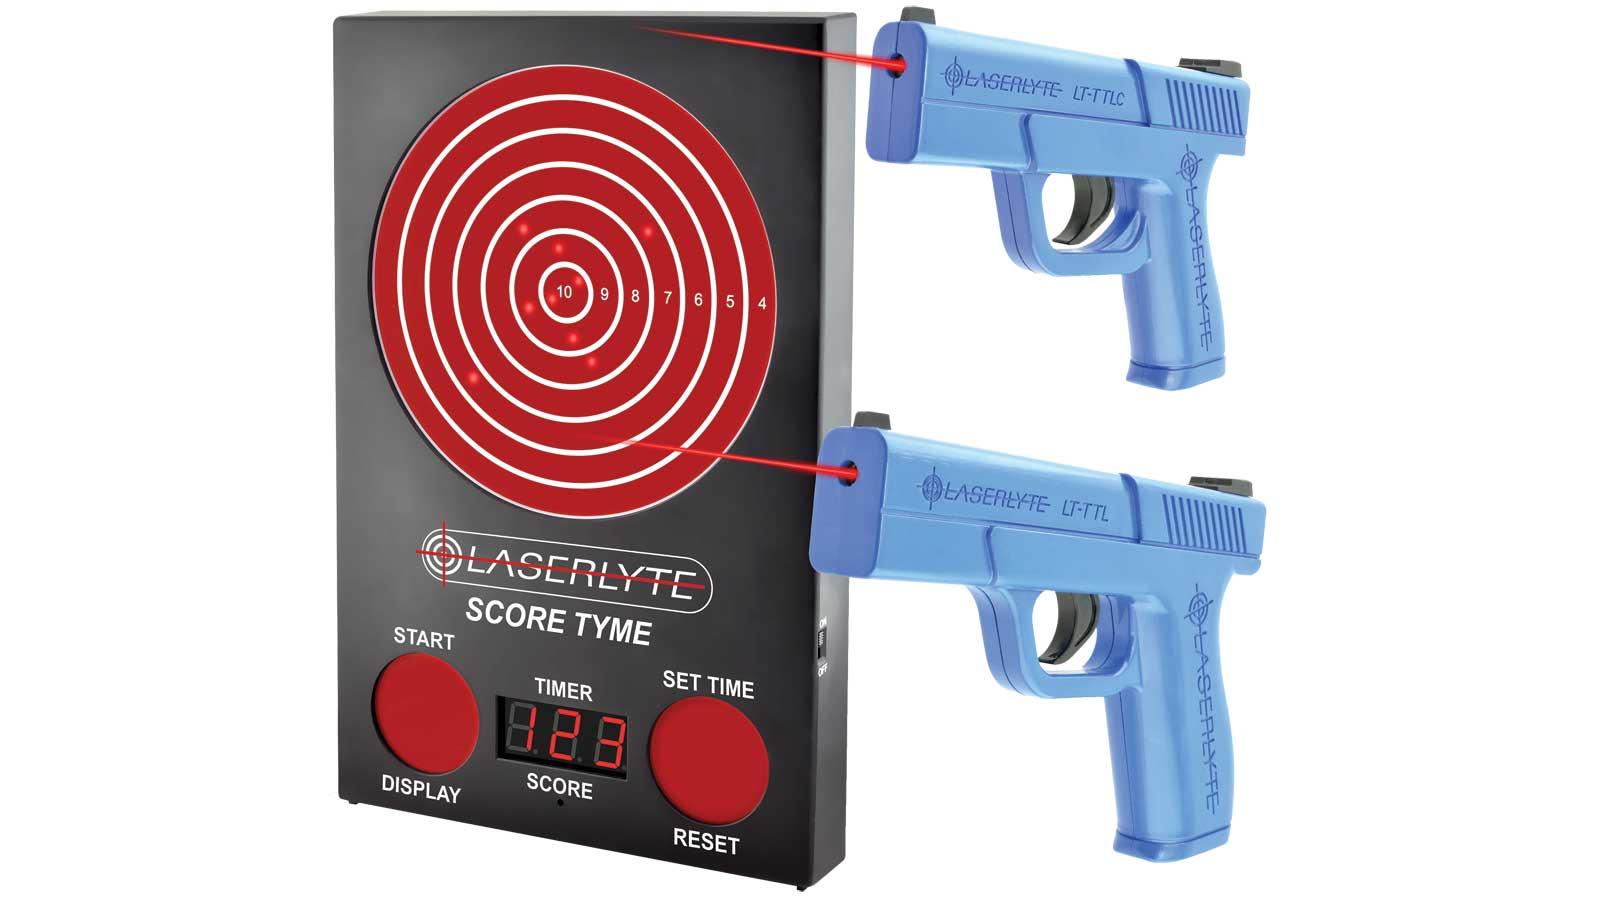 LaserLyte Scoretyme Versus Kit: Scoretymet Target, 2 Pistols, SC